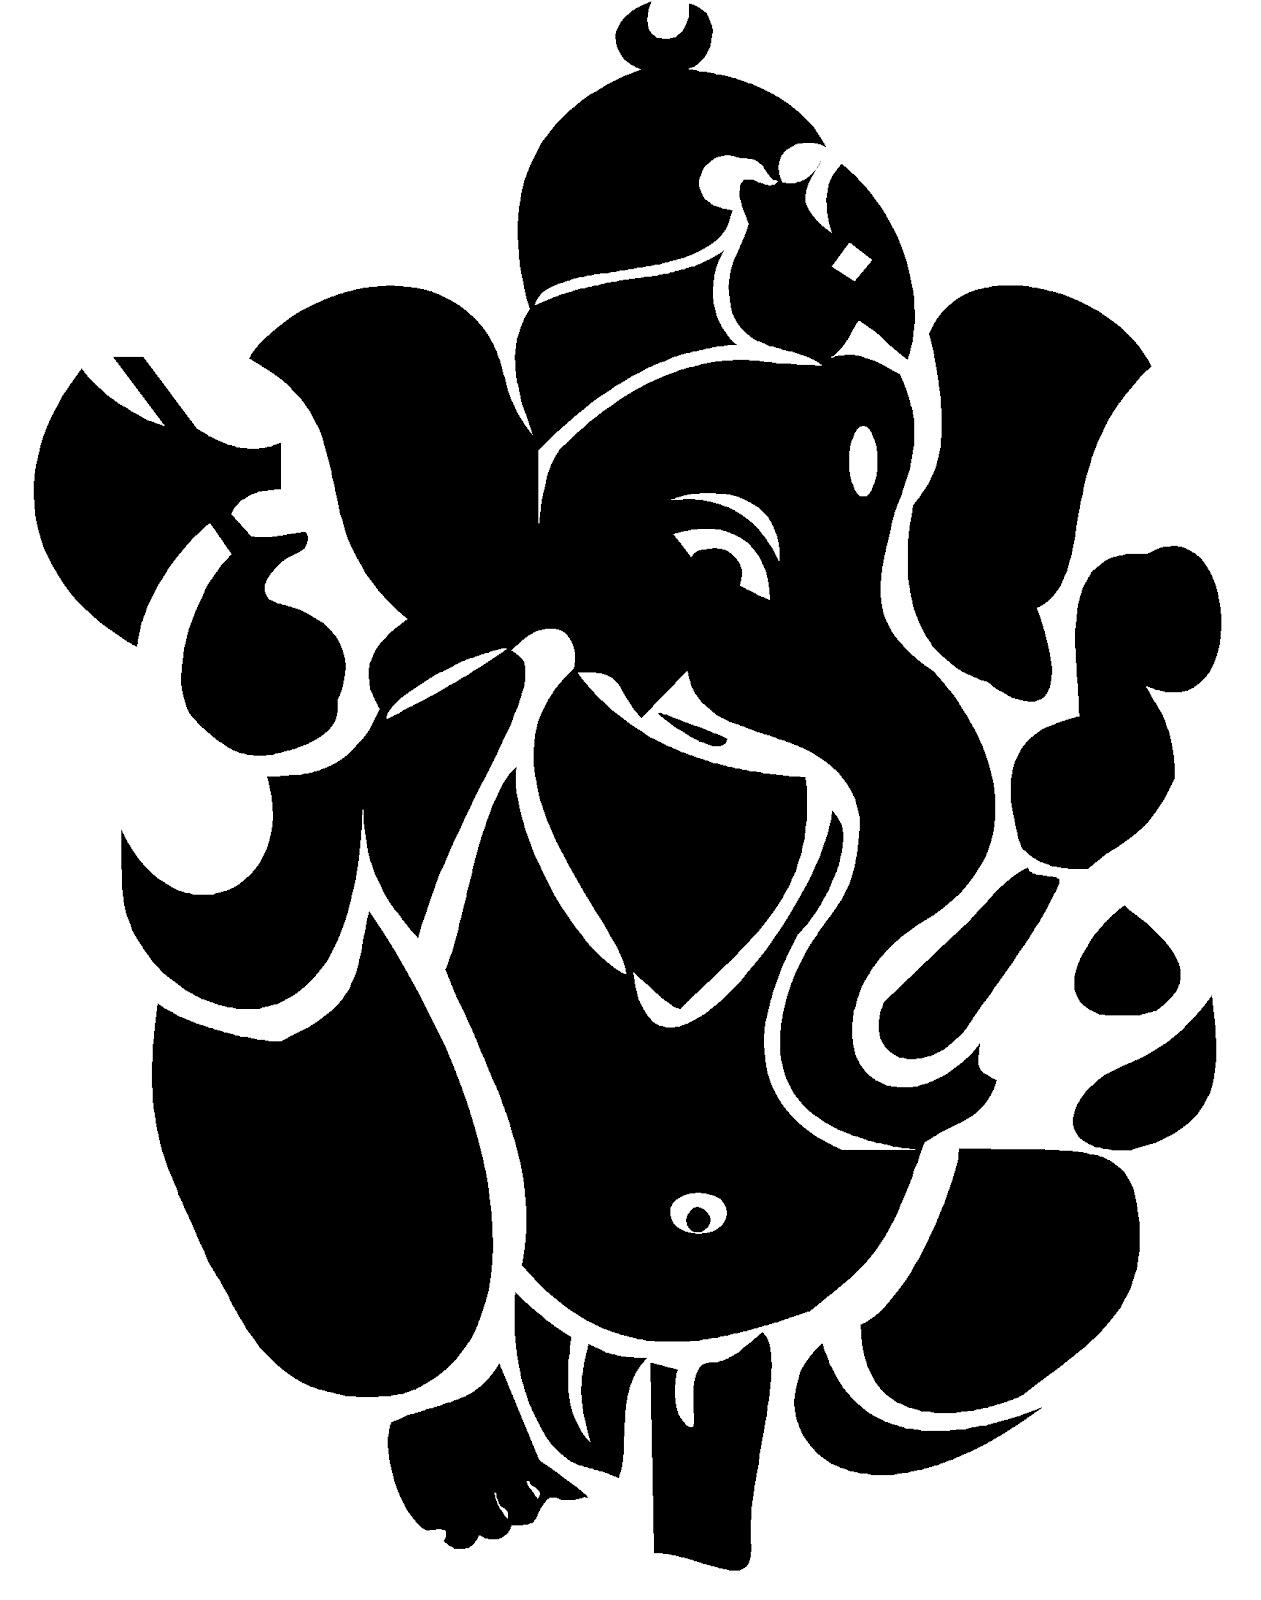 Free Ganesh Black And White, Download Free Clip Art, Free Clip Art.